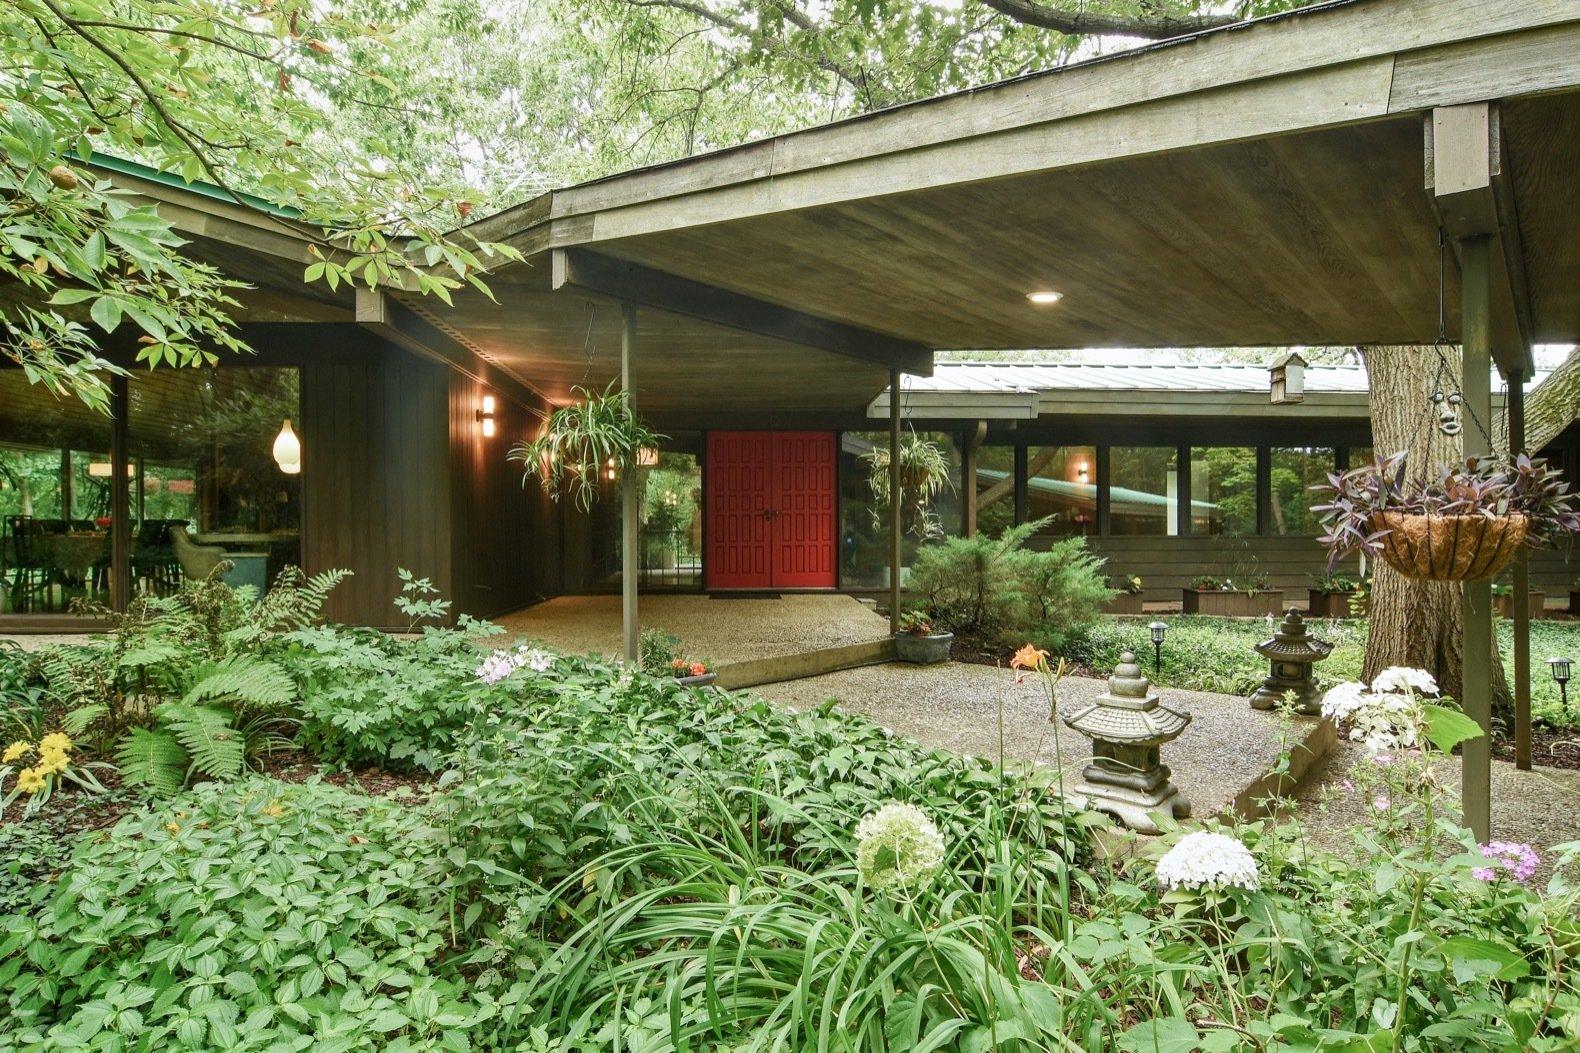 A frank lloyd wright inspired home near chicago hits the - Frank lloyd wright homes for sale ...